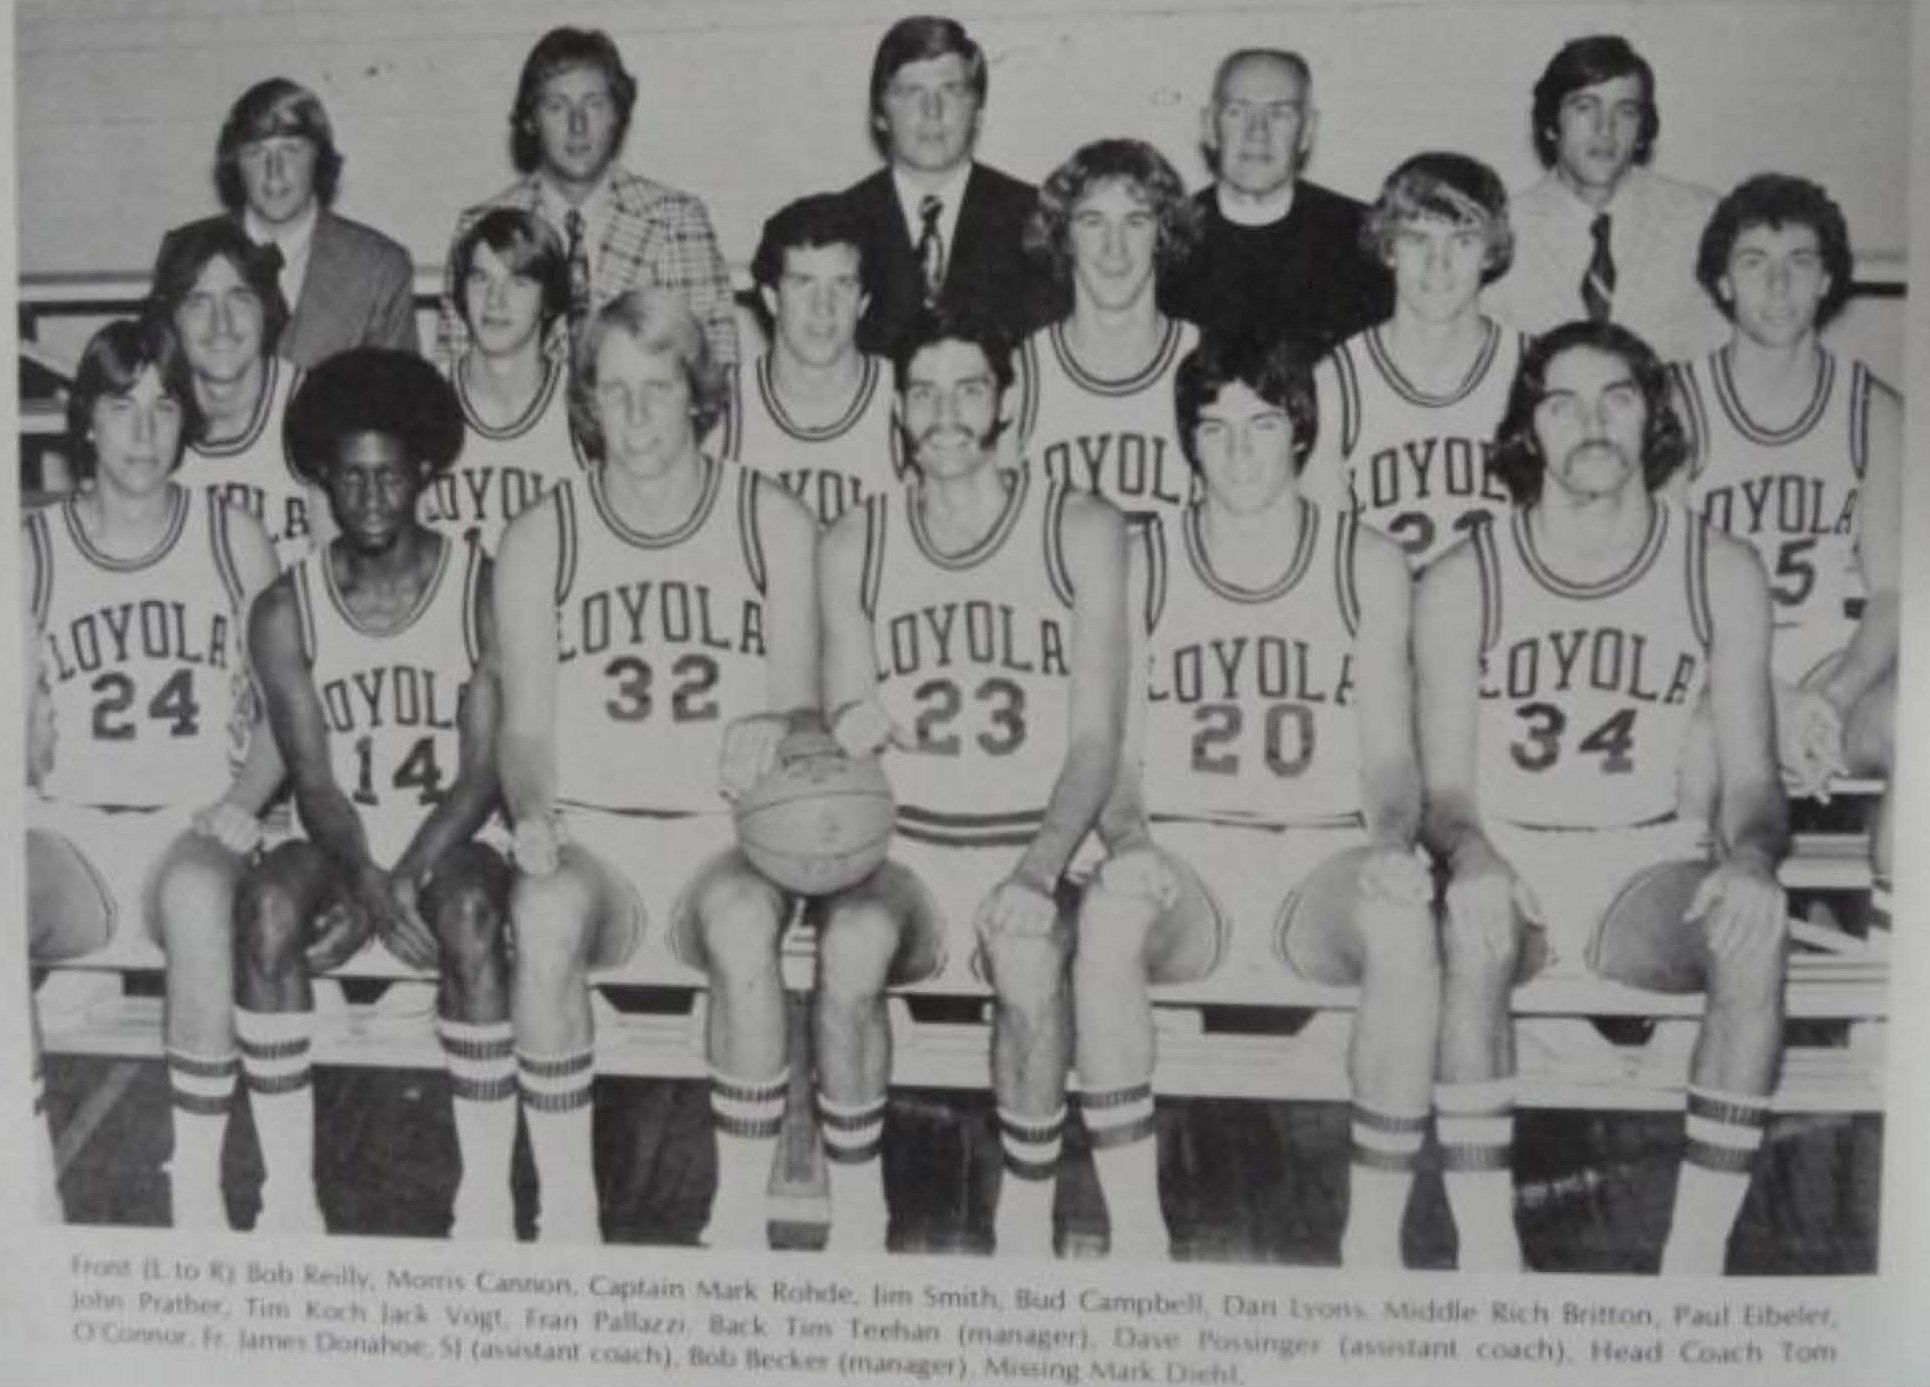 1975-76 Loyola Maryland men's basketball team (photo by Jimmy Smith)